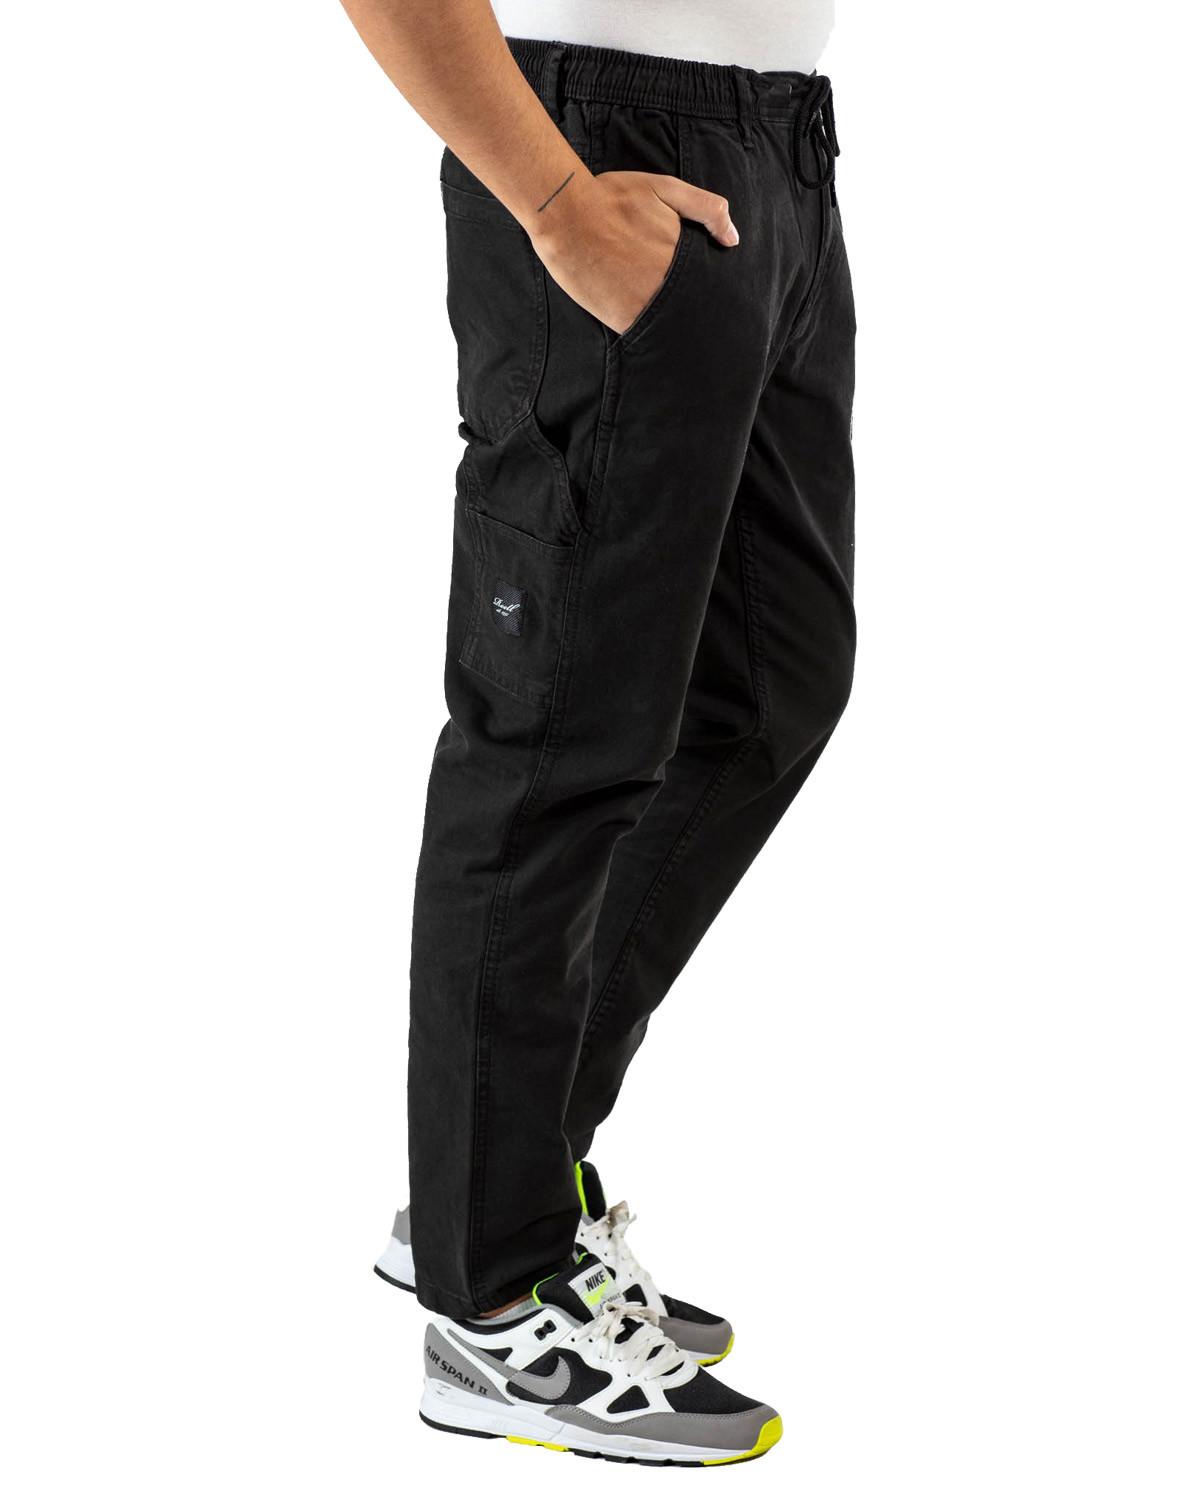 Reell Reflex Easy Worker Pant Black (Black, W34 / L32)